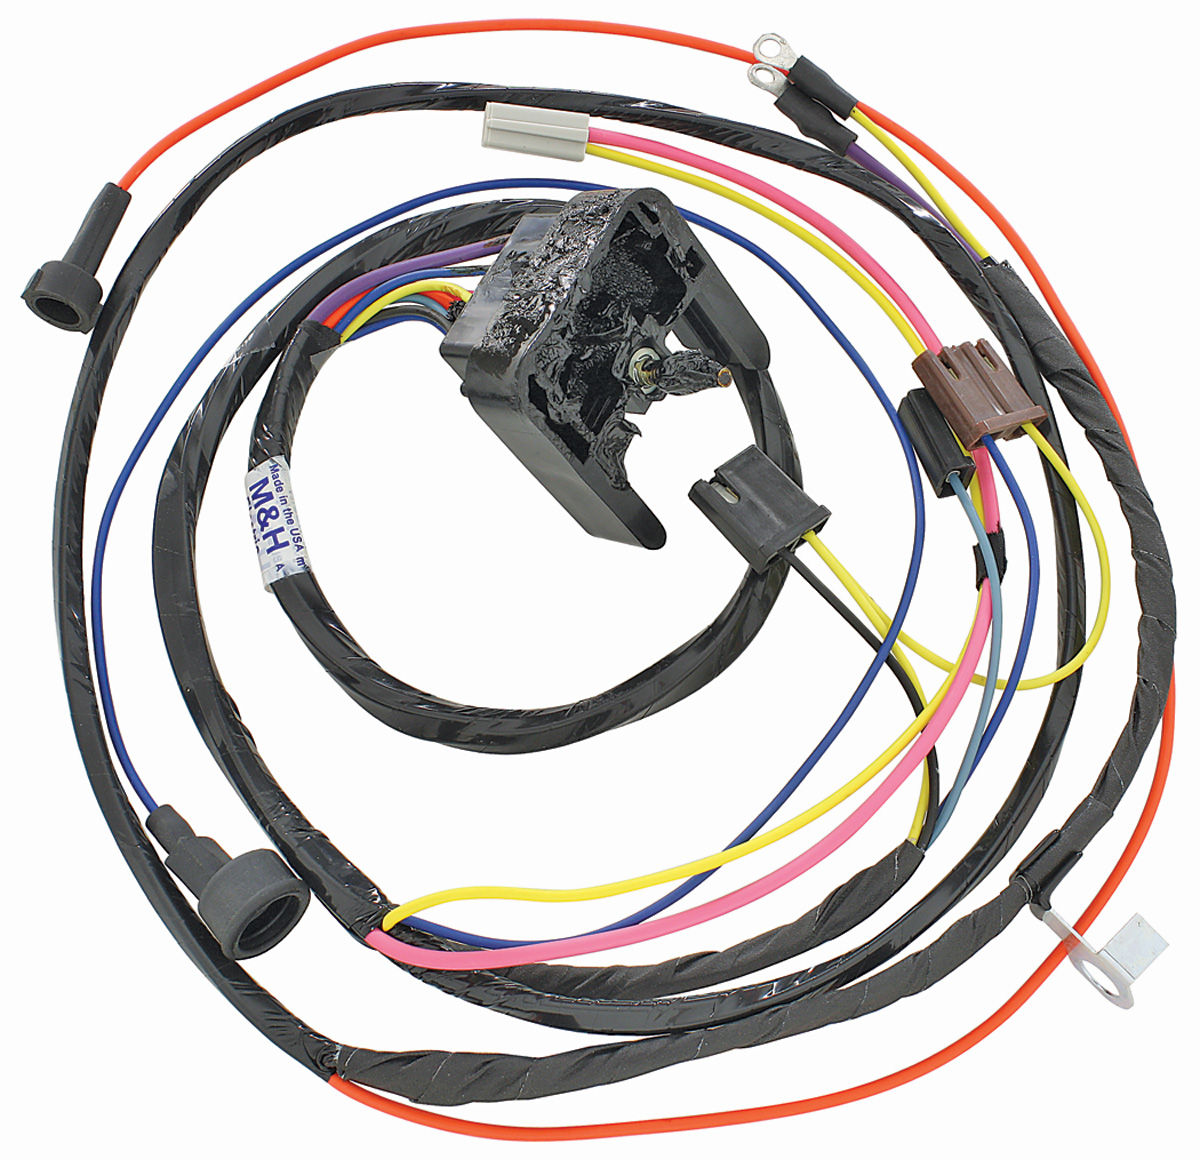 original 68 camaro wiring harness complete wiring diagram inside1968 camaro engine wiring diagram schematic 21 [ 1200 x 1160 Pixel ]